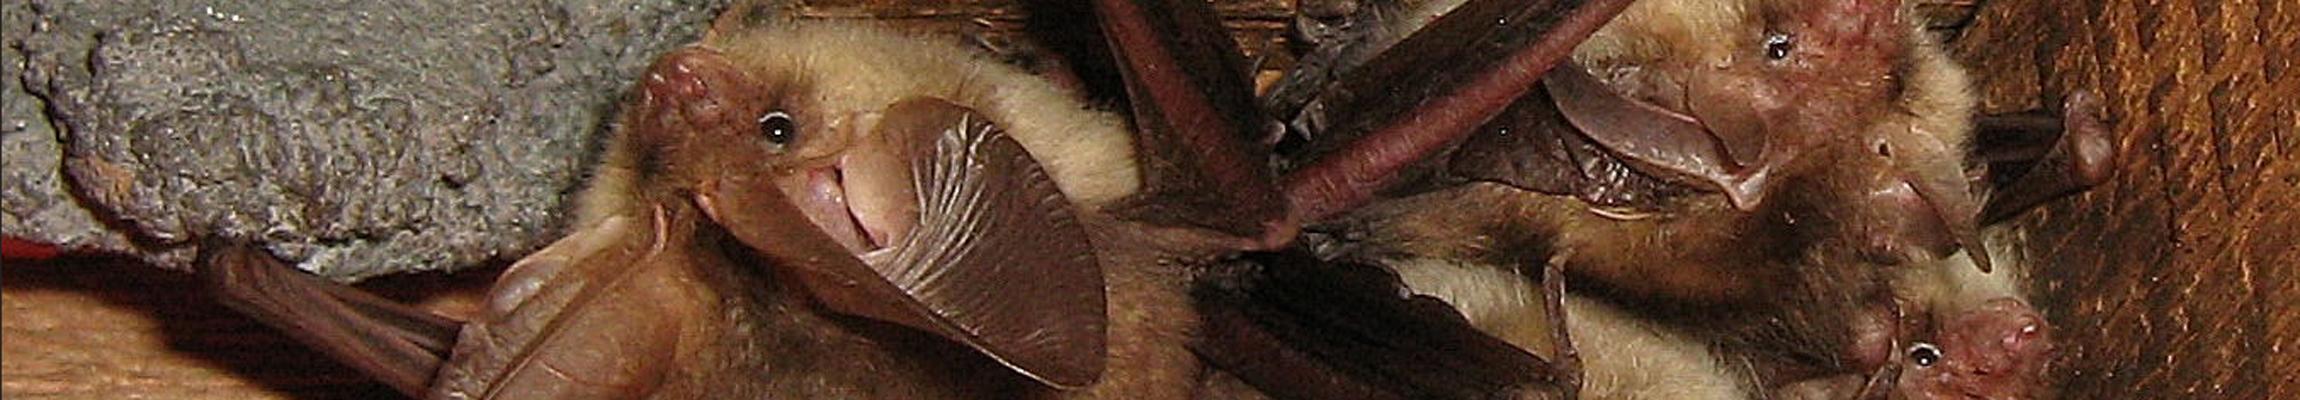 bats-hanging